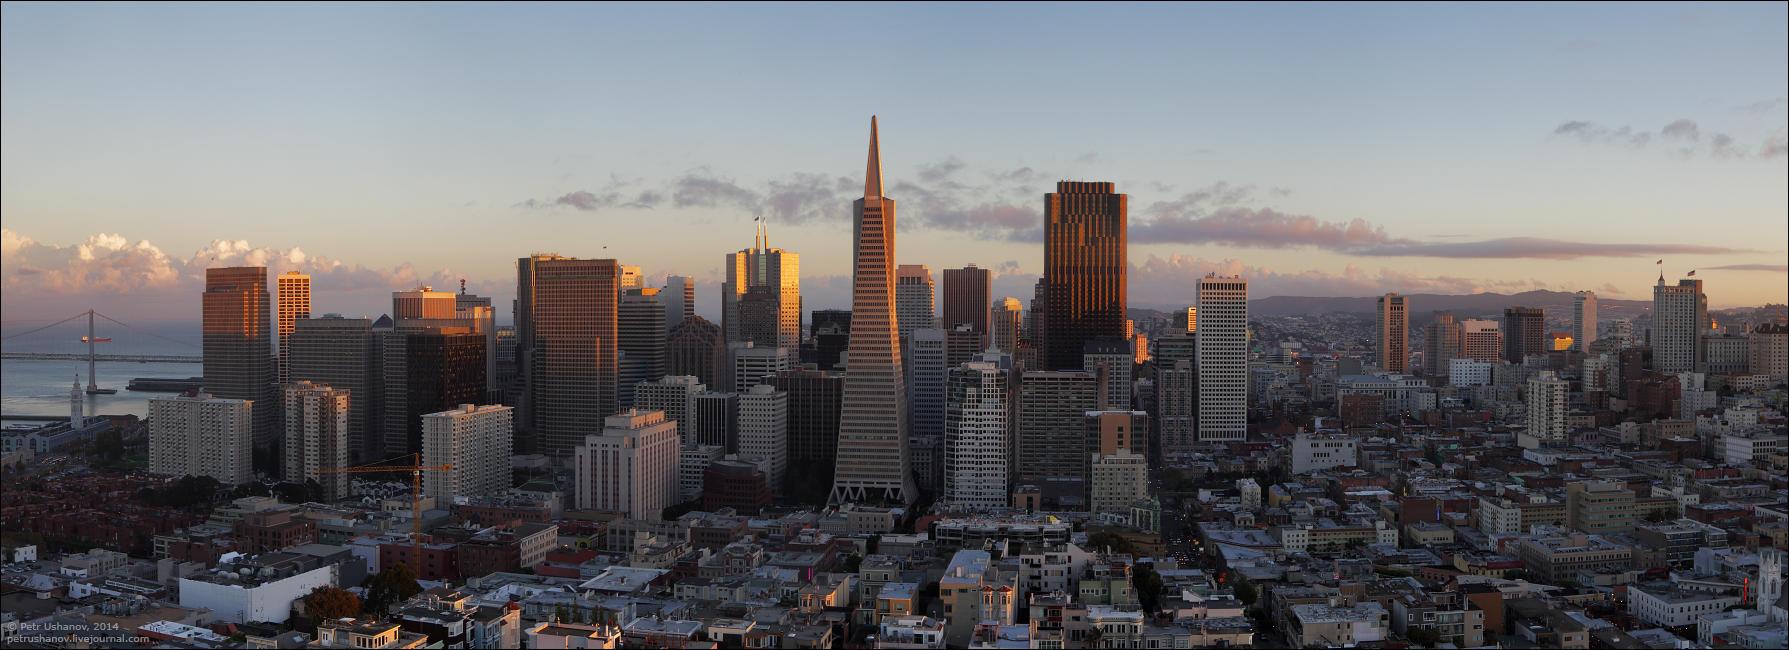 SFpanorama06 Сан Франциско   панорамы города